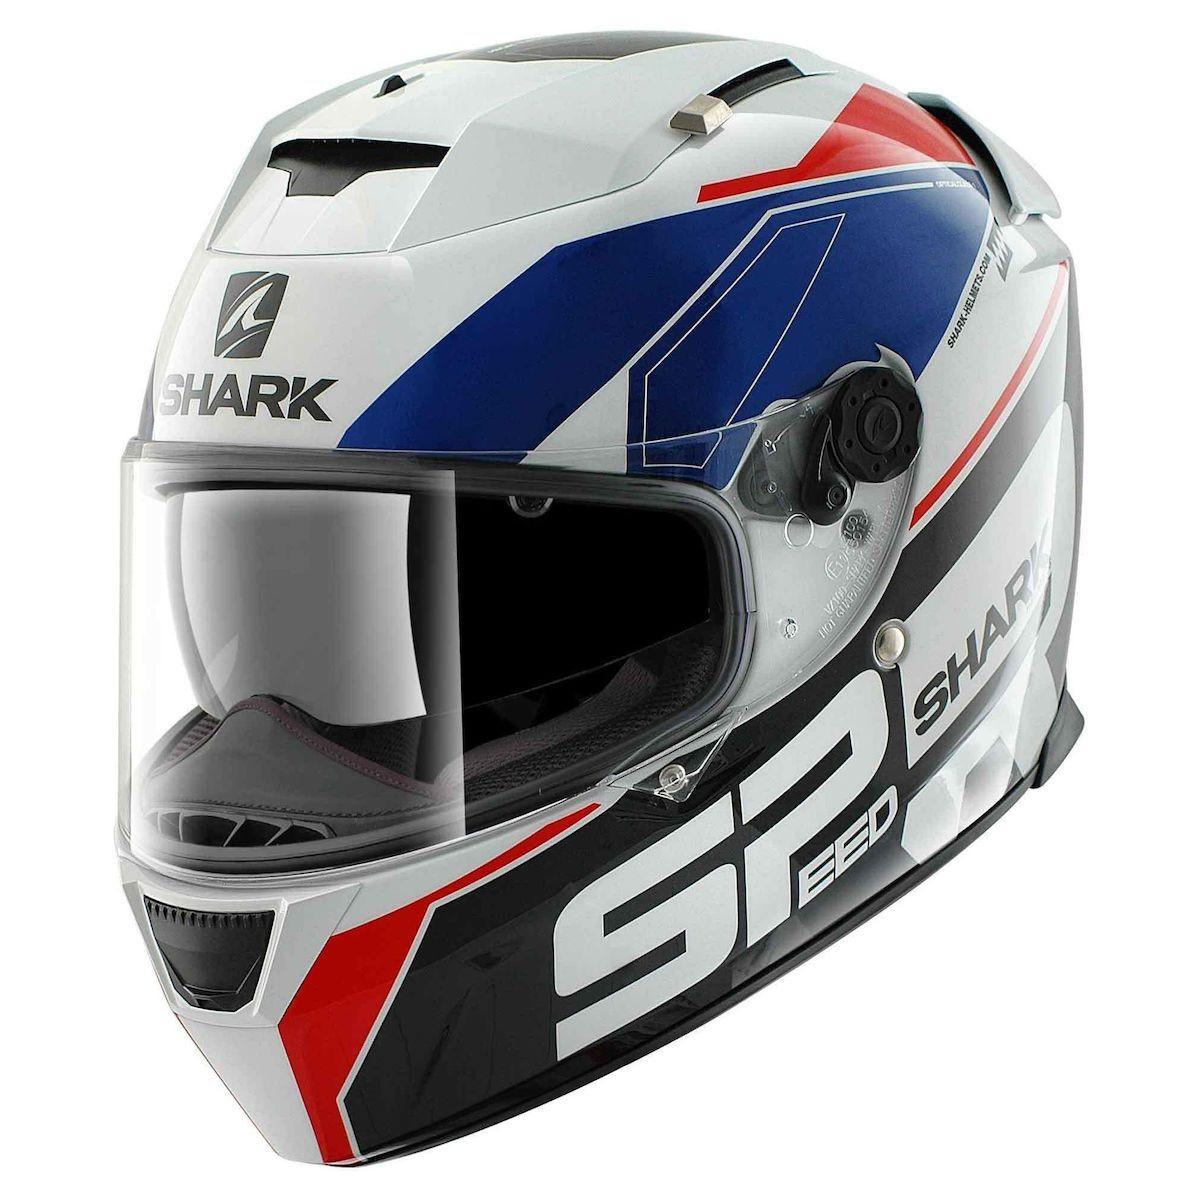 shark speed r series 2 sauer helmet motorcycle house. Black Bedroom Furniture Sets. Home Design Ideas